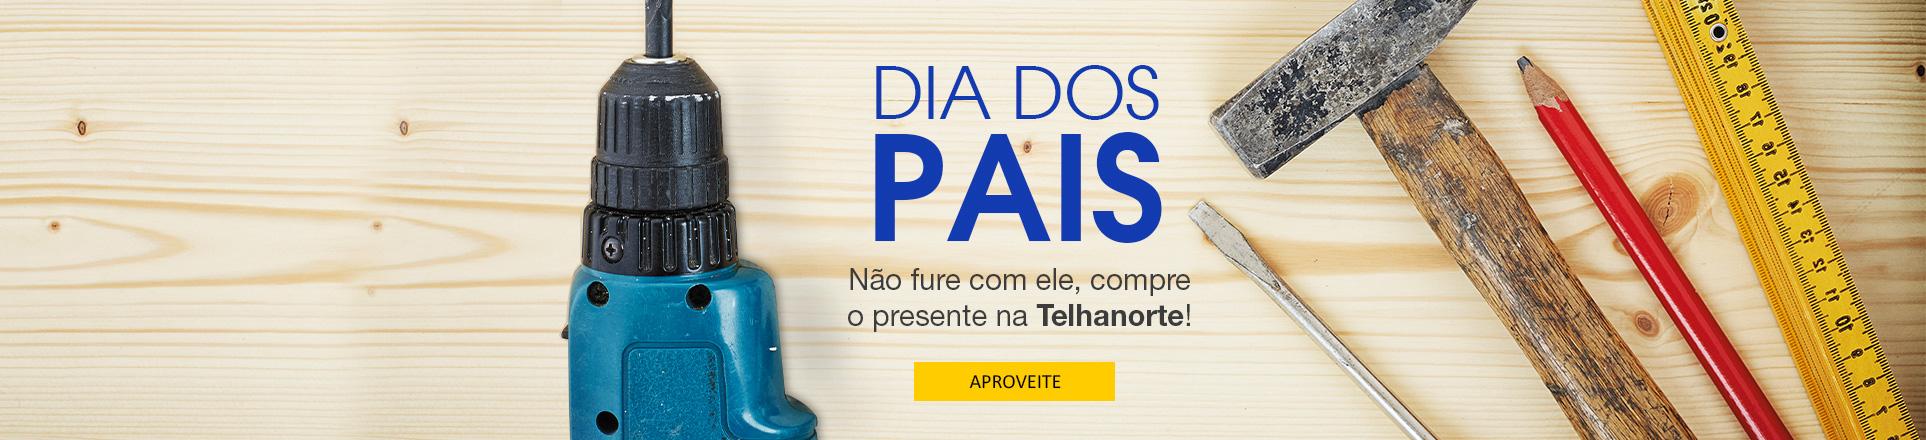 Banner 1 - Dia dos Pais - Tablóide